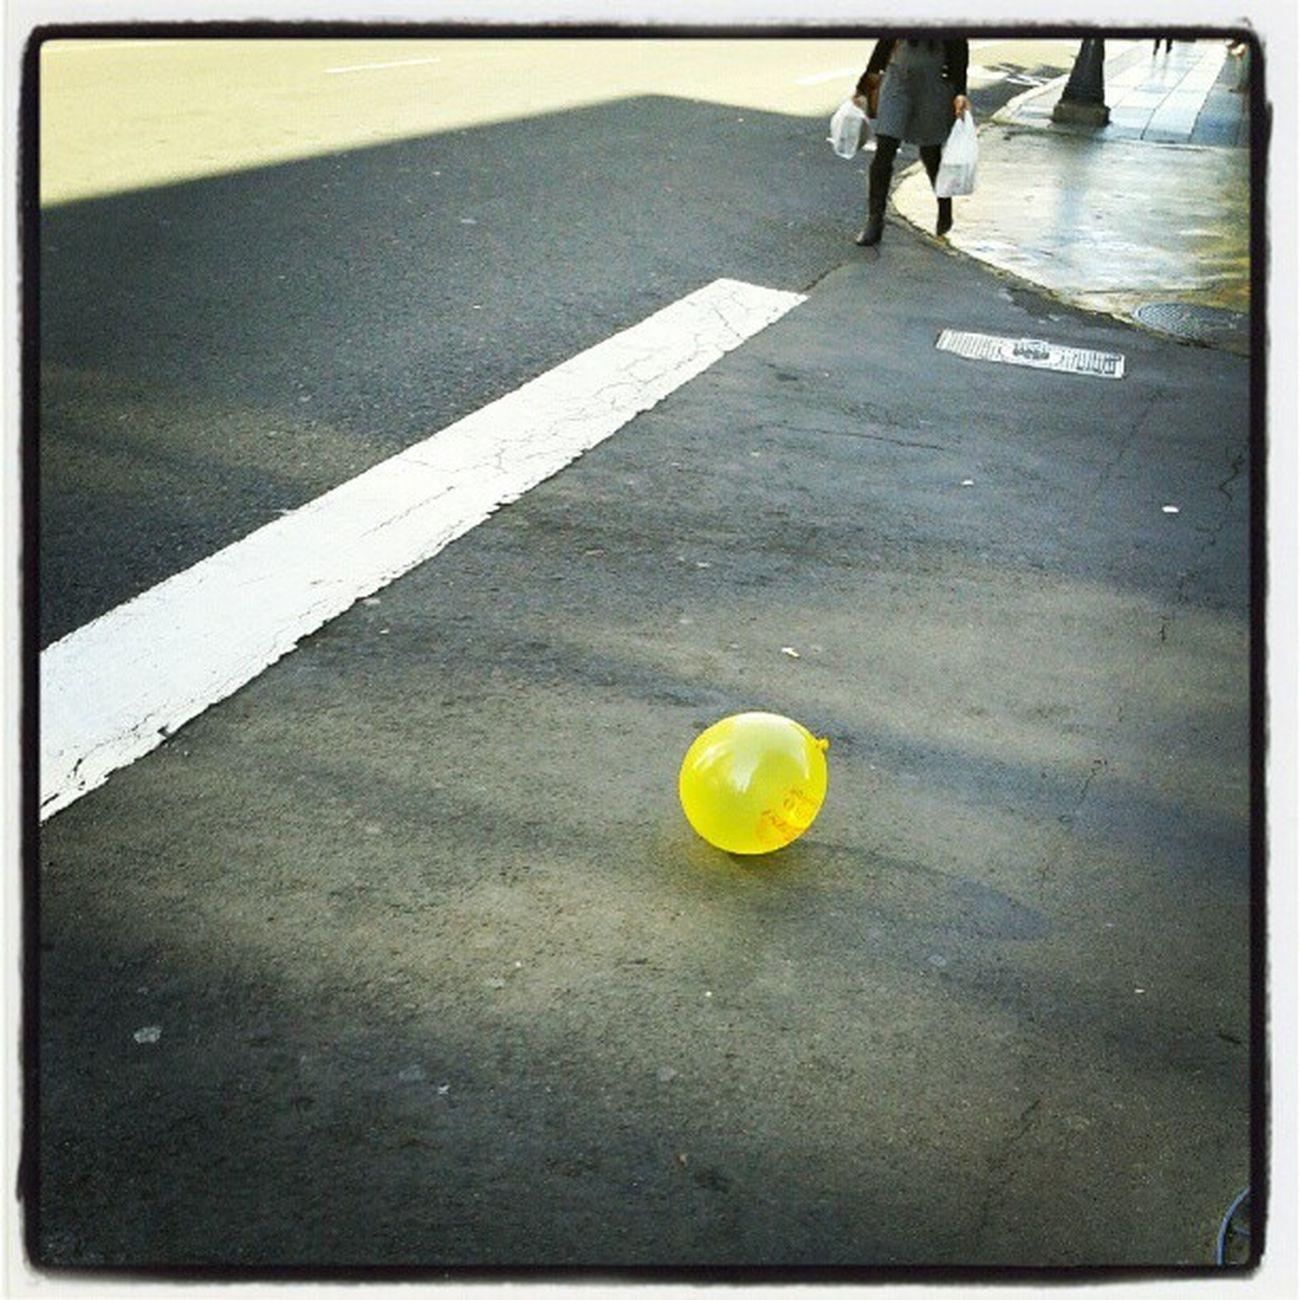 Globo amarillo sin dueño | Yellow balloon without owner Globo Sopladera Amarillo Amarilla Street Calle Yellow Balloon